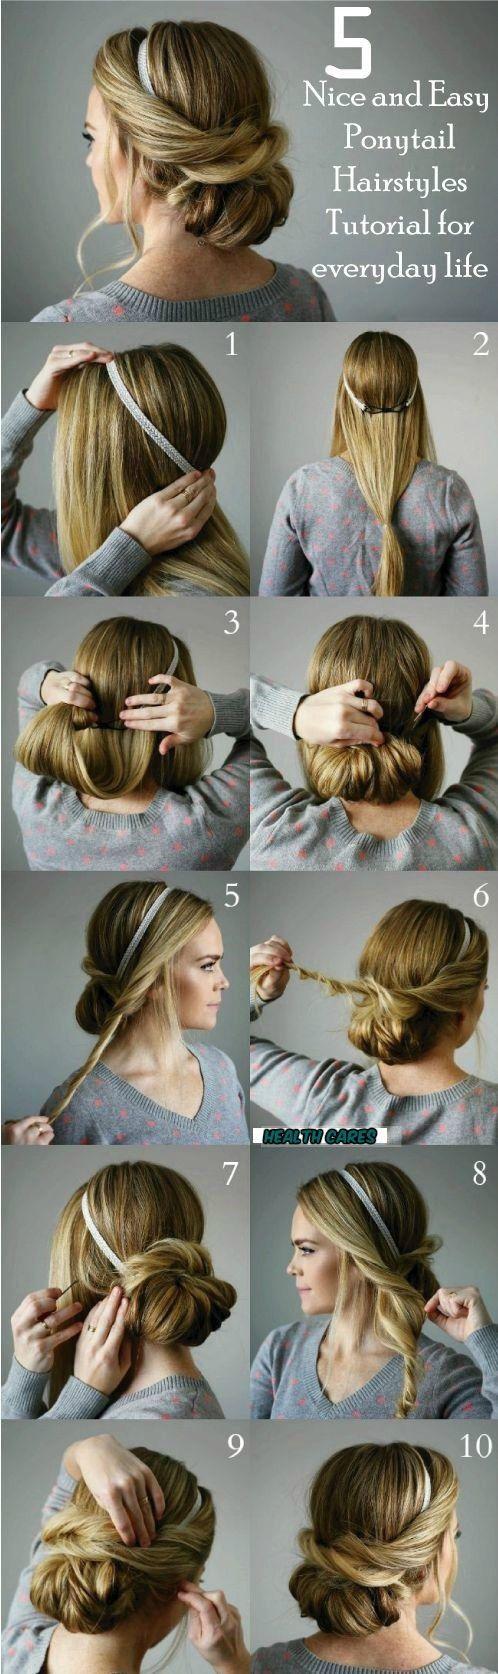 sopretty hairstyles for long hair pinterest easy girl